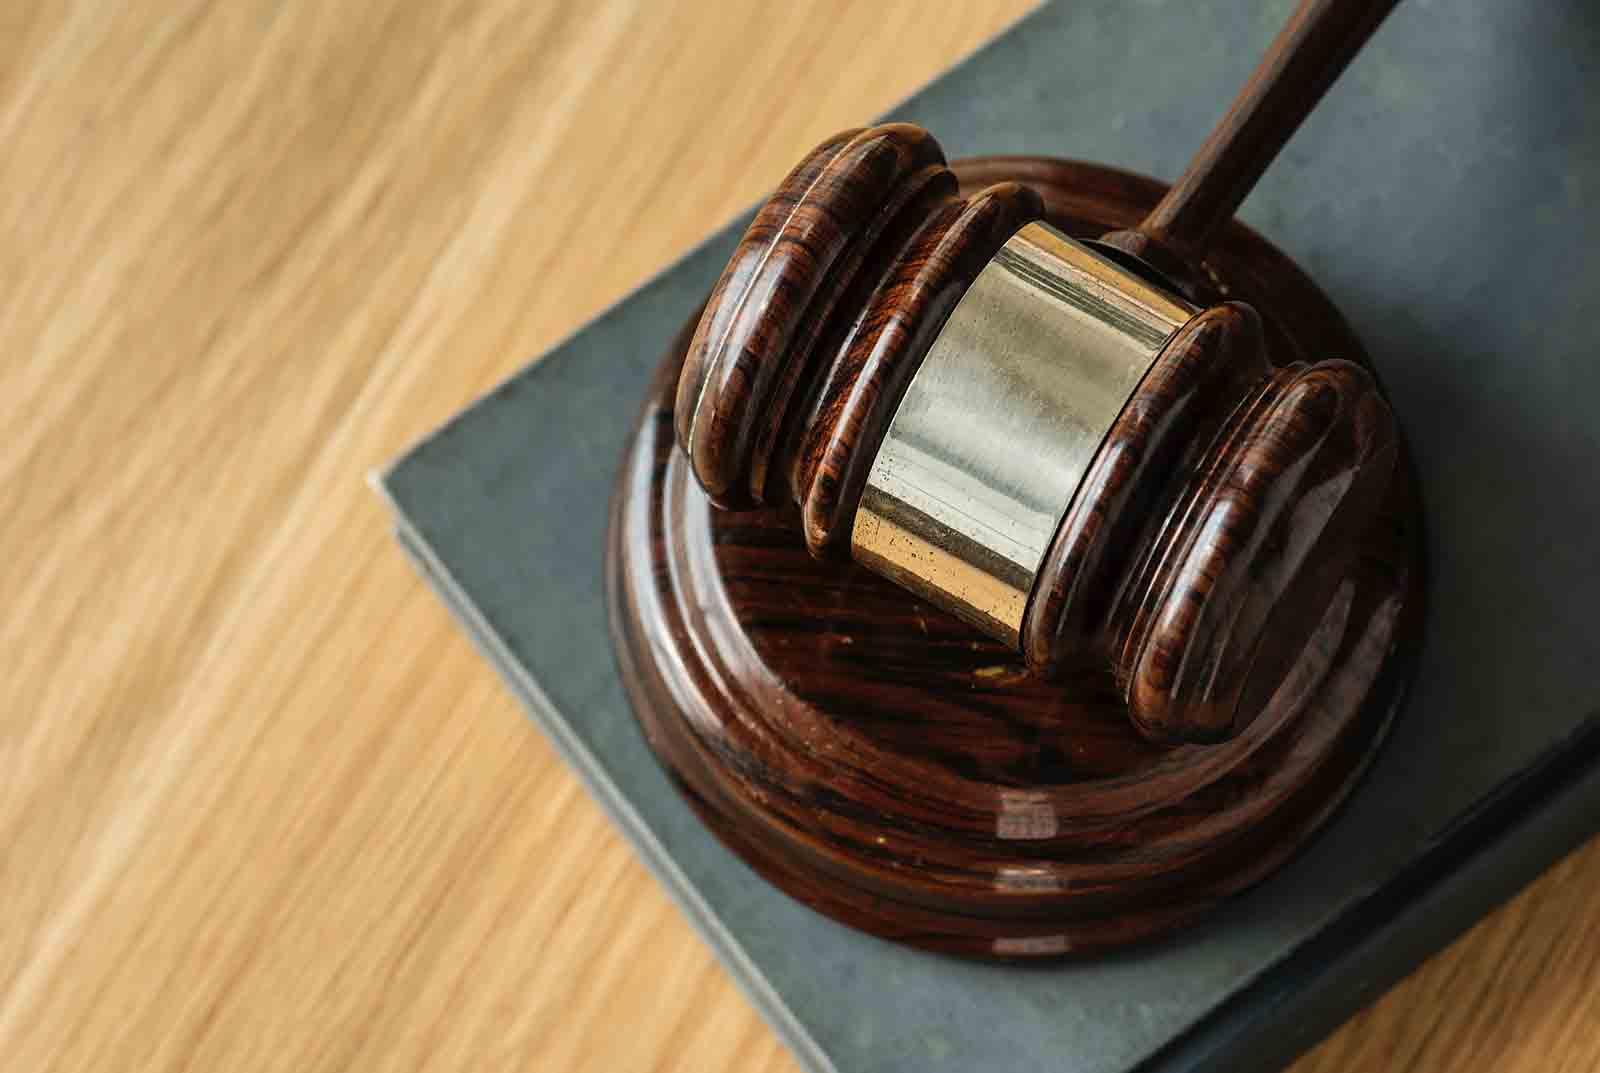 Tribunal de justicia Abogados valencia